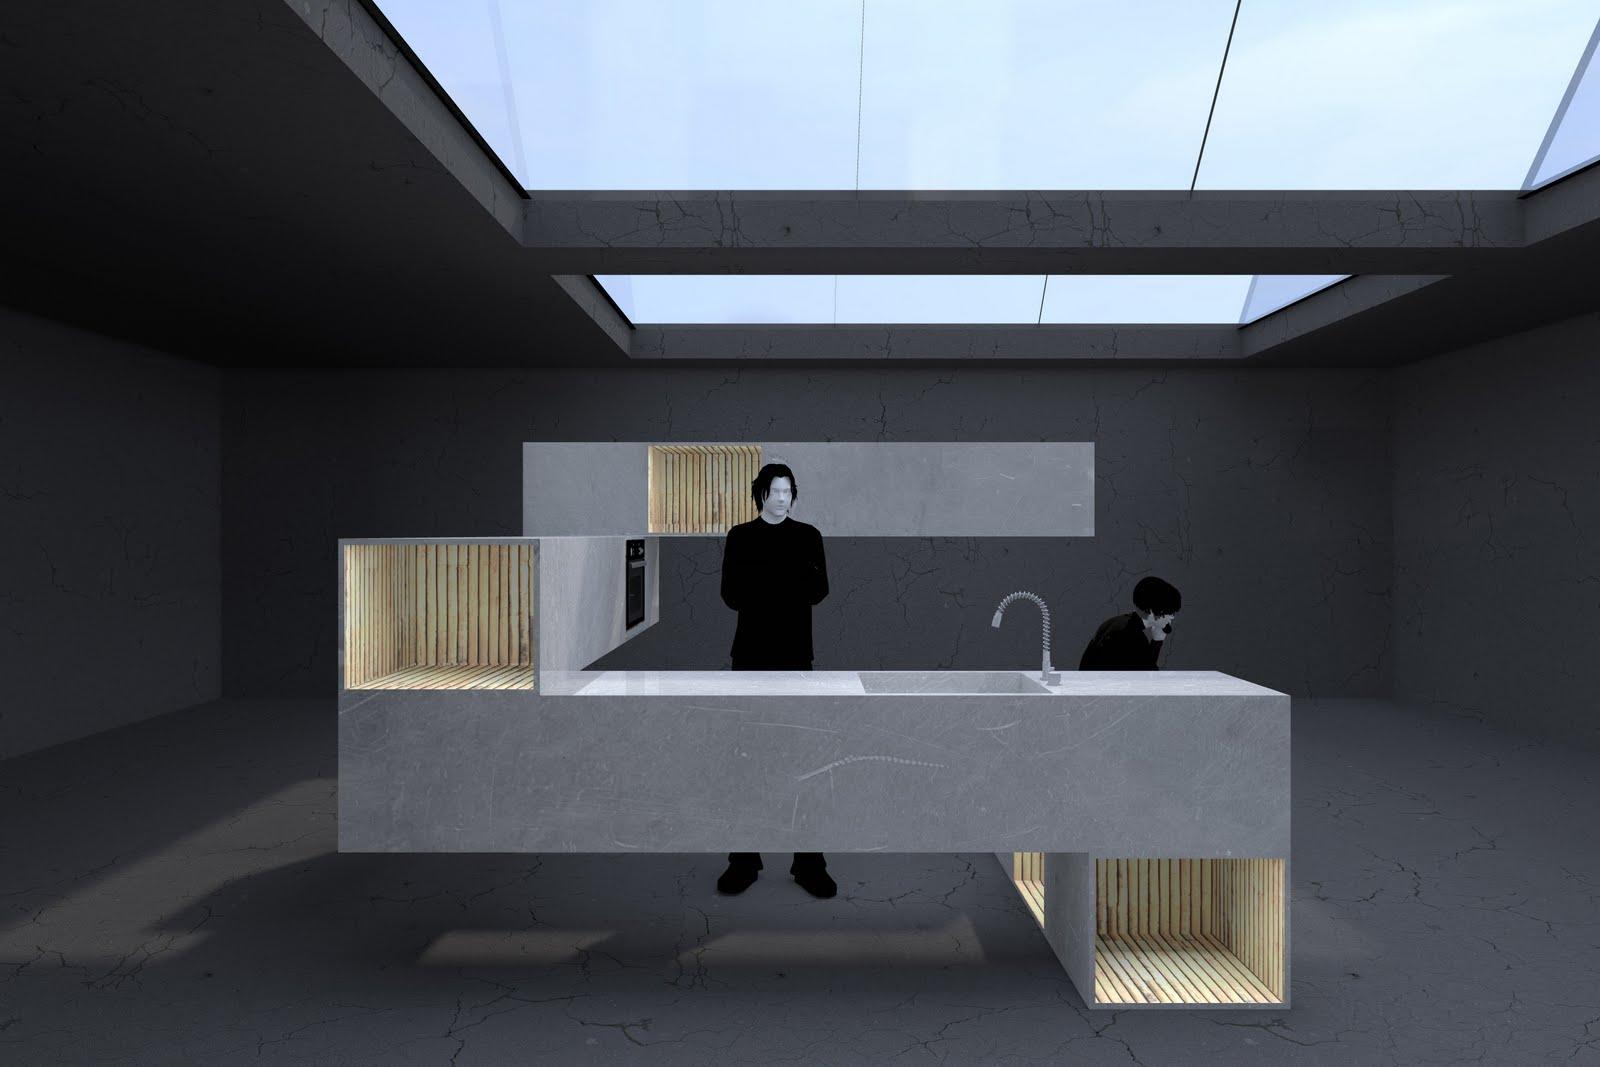 Kitchen Design Competition Captivating Kitchen Design Competition